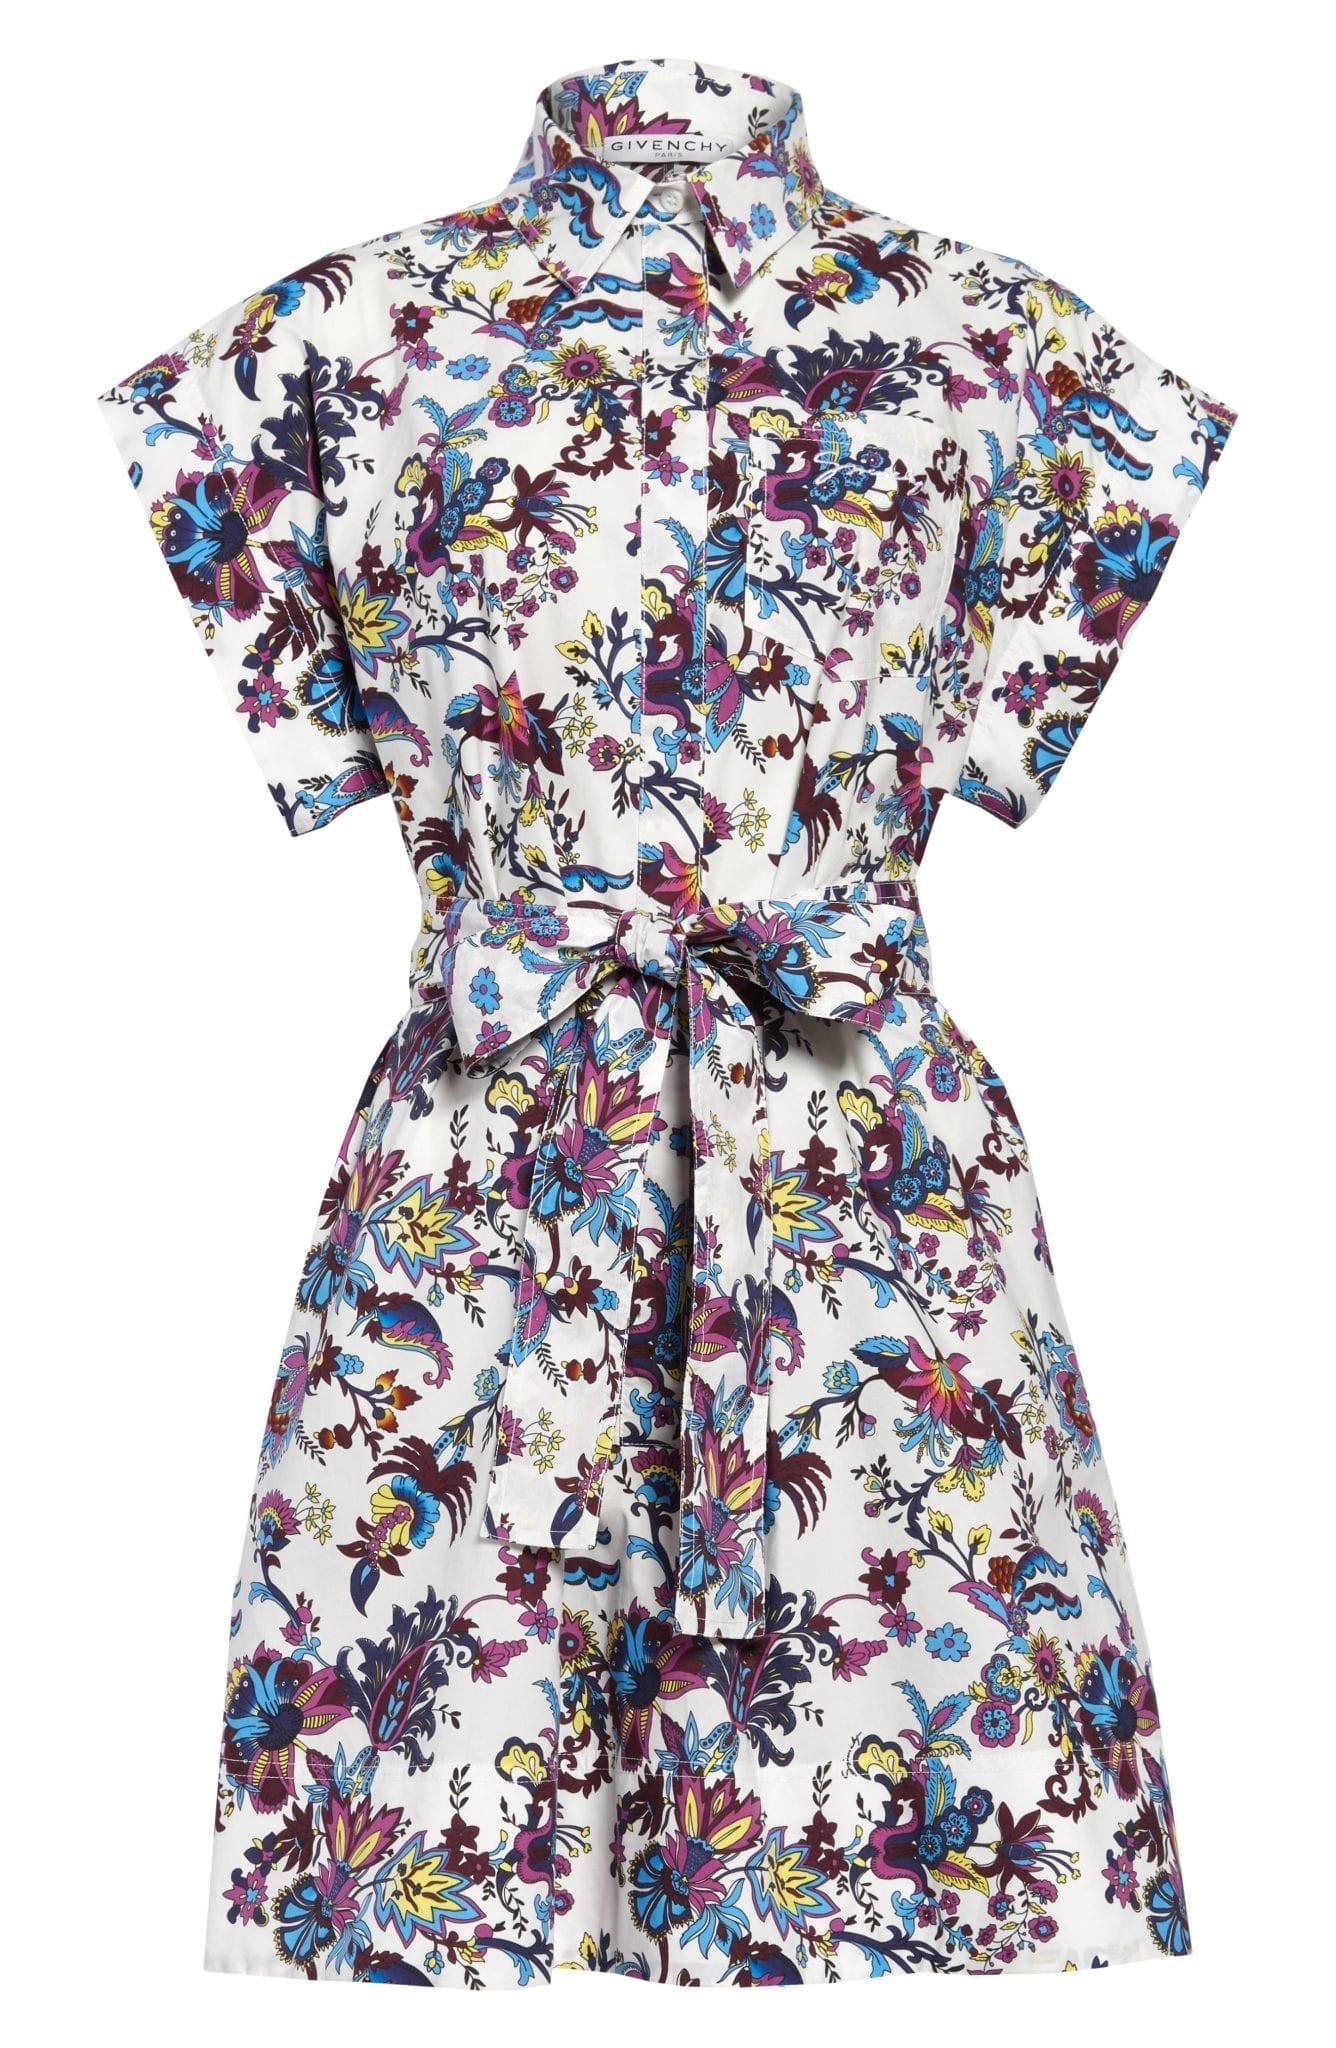 GIVENCHY Floral Print Cotton Poplin Shirt Dress